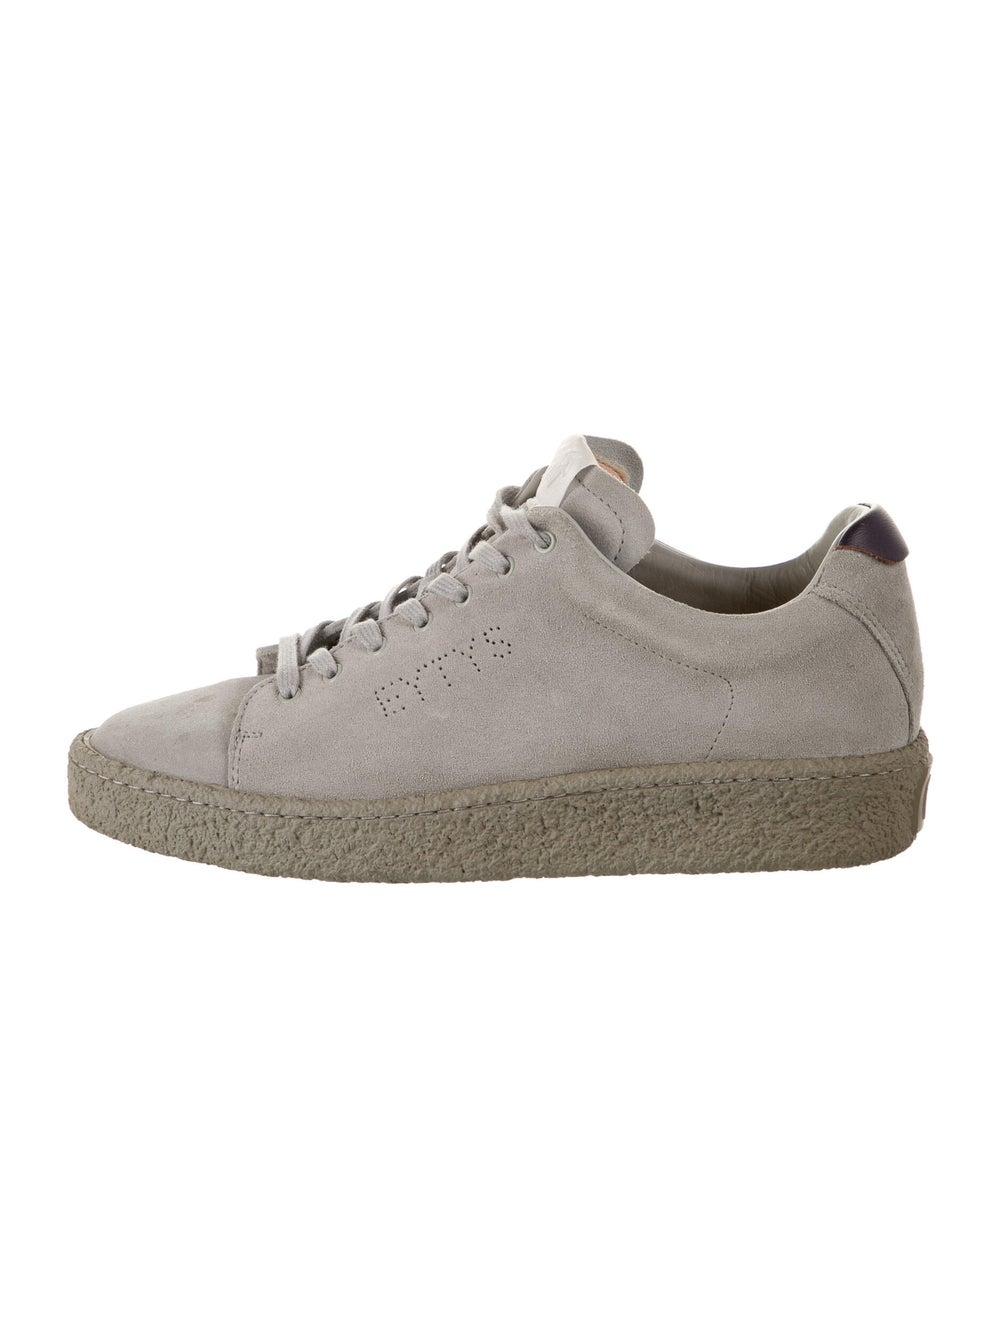 Eytys Suede Sneakers Grey - image 1